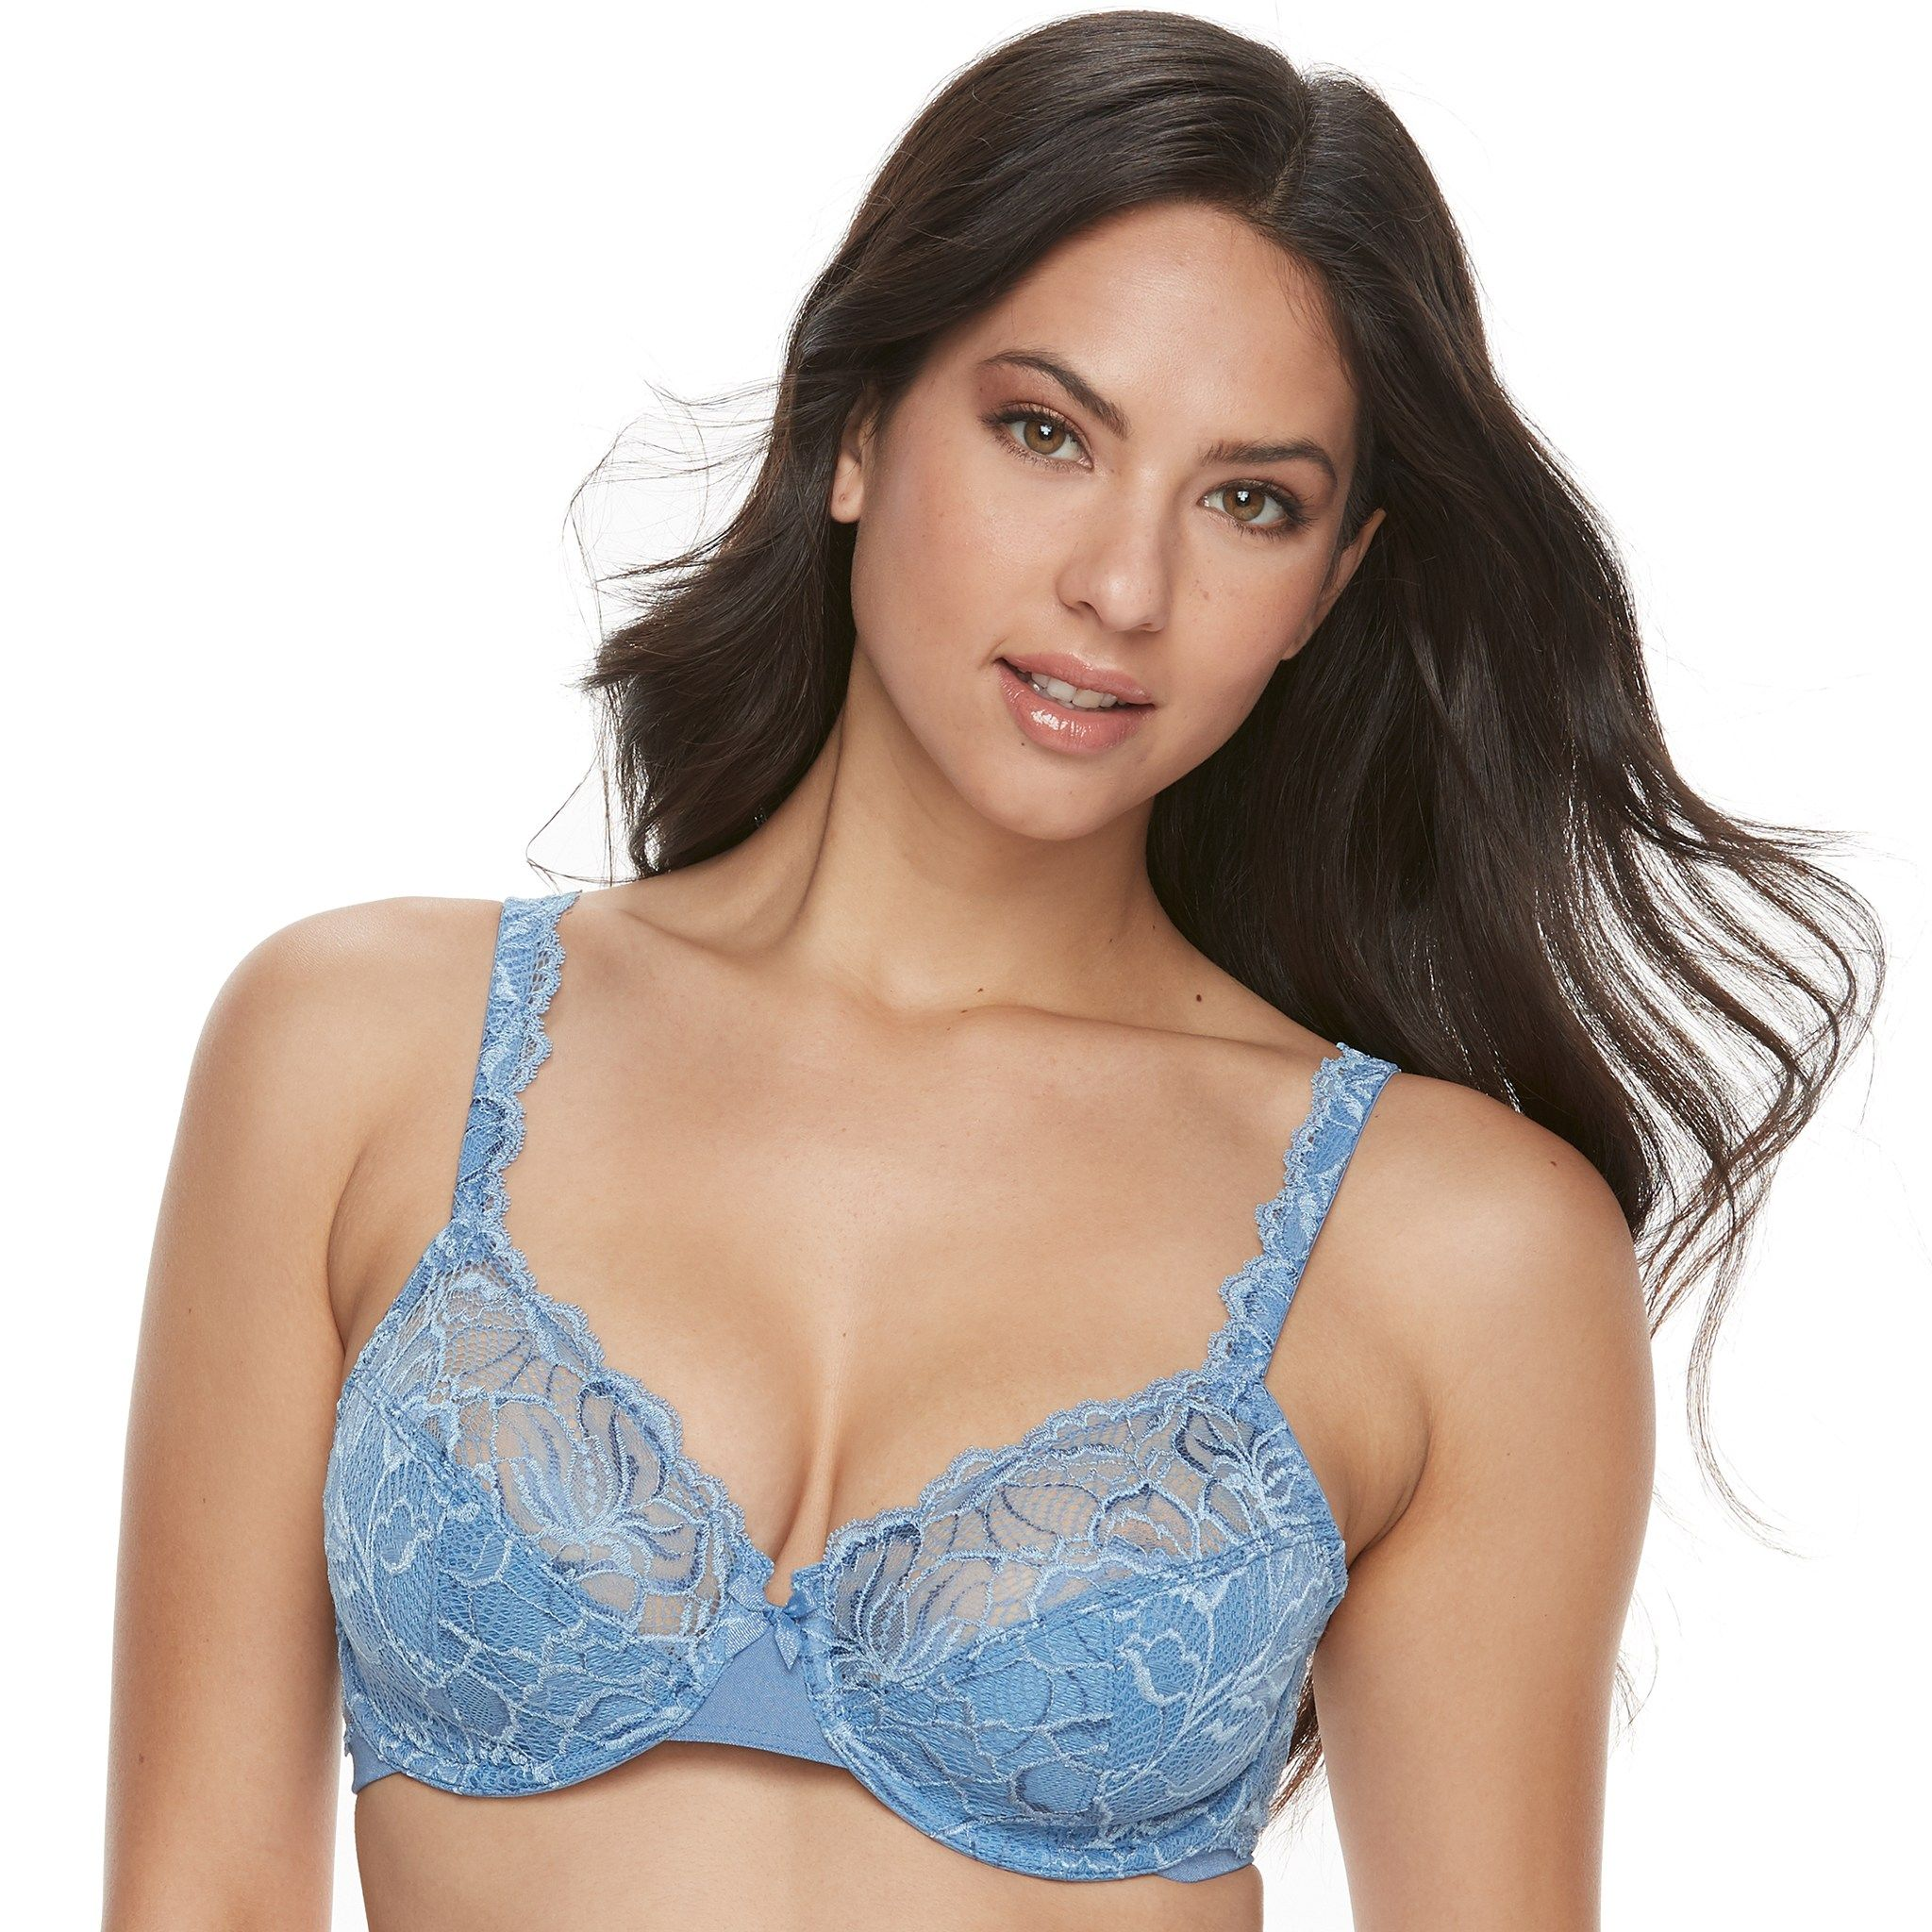 99f2dca182207 Bali Bras  Lace Desire Lightly Lined Underwire Bra 6543